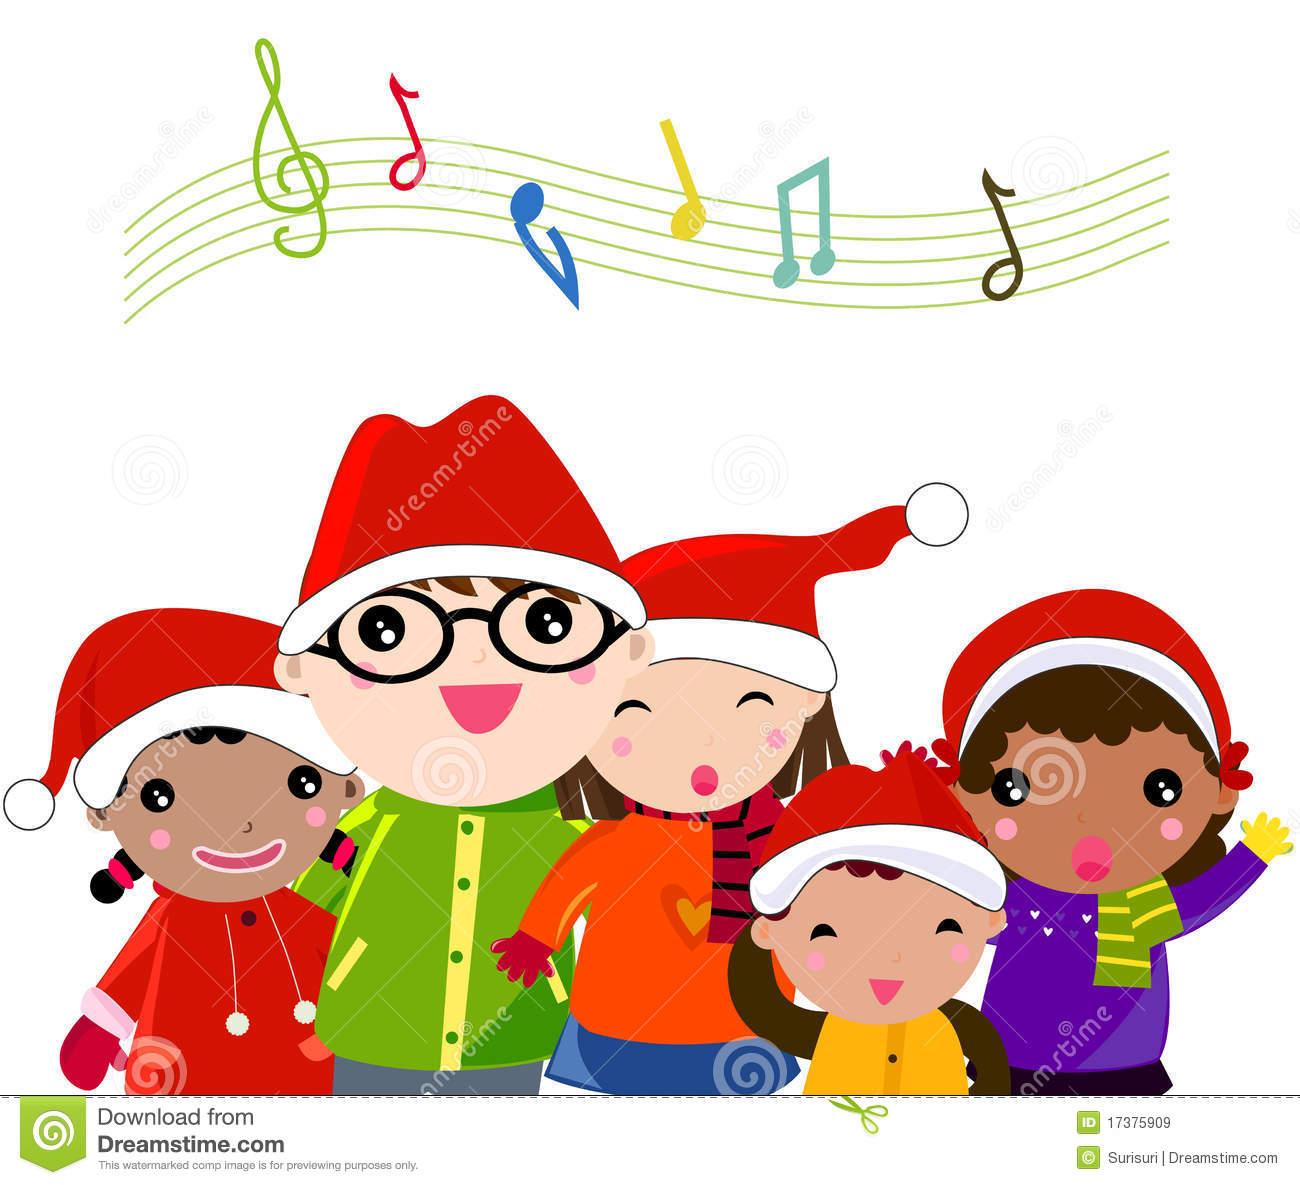 Christmas carol singing clipart svg royalty free Christmas Carol Clip Art & Look At Clip Art Images - ClipartLook svg royalty free